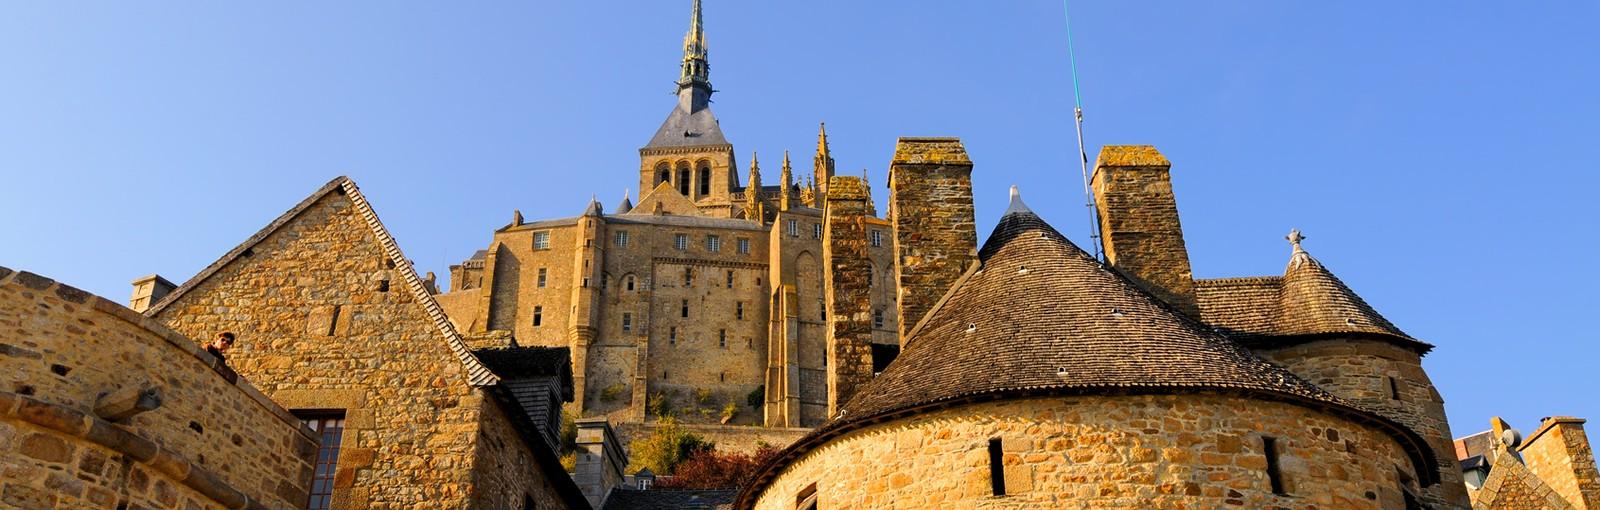 Tours Mont-Saint-Michel - Full days - Day tours from Paris